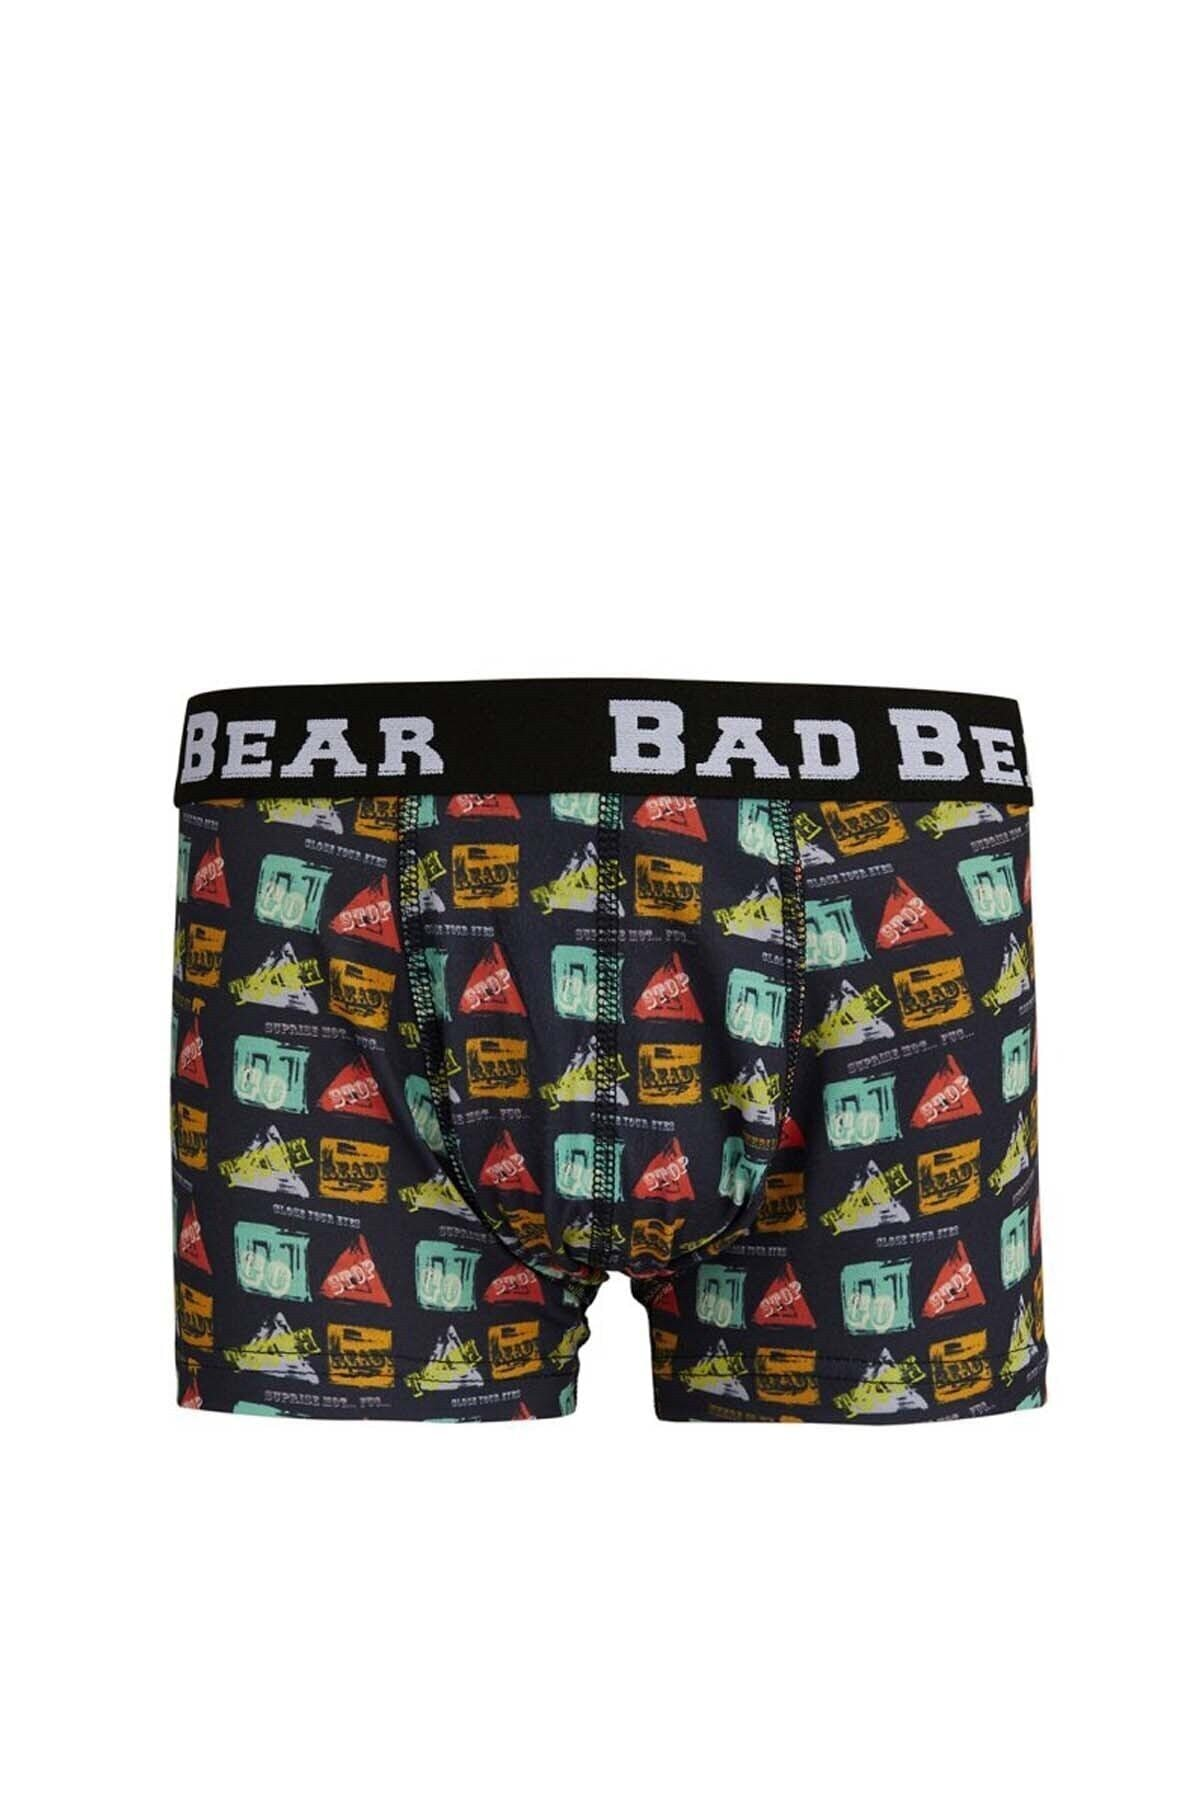 Bad Bear Sıgnal Uw Erkek Boxer 20.01.03.005raven 1